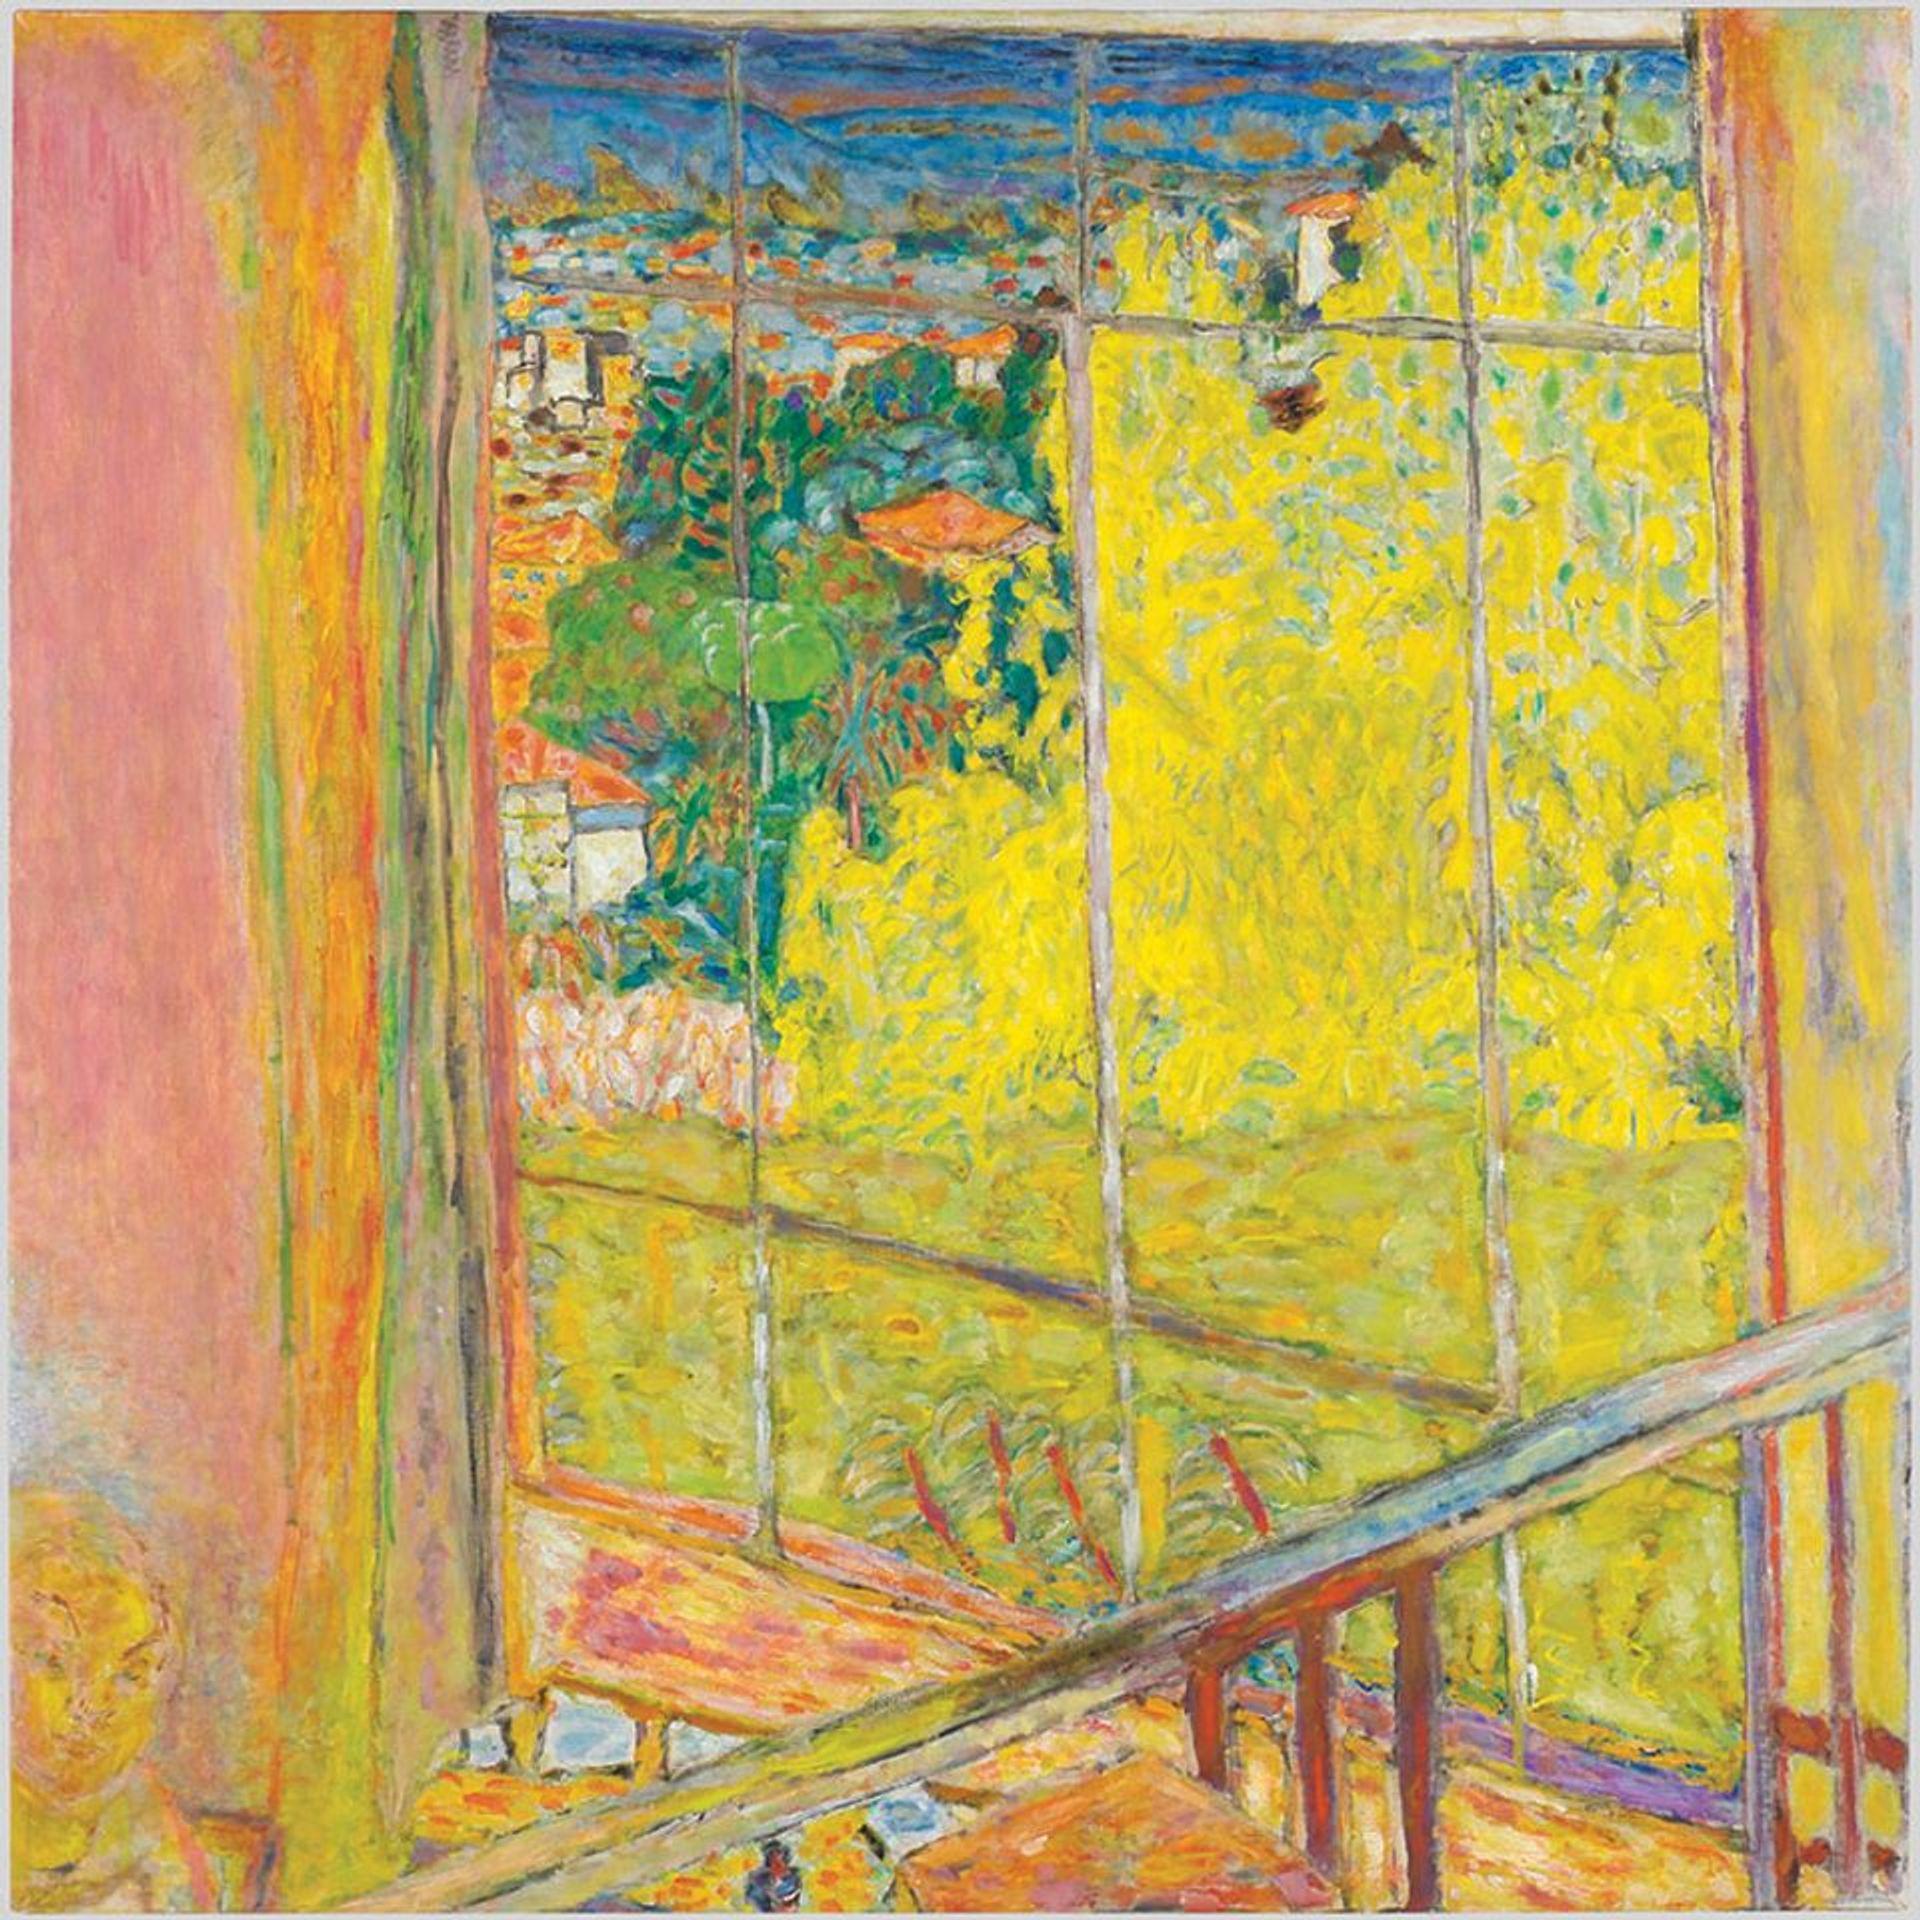 Pierre Bonnard's The Studio with Mimosa (1939-46) © Bertrand Prévost;  Centre Pompidou/MNAM-CCI/RMN-Grand Palais